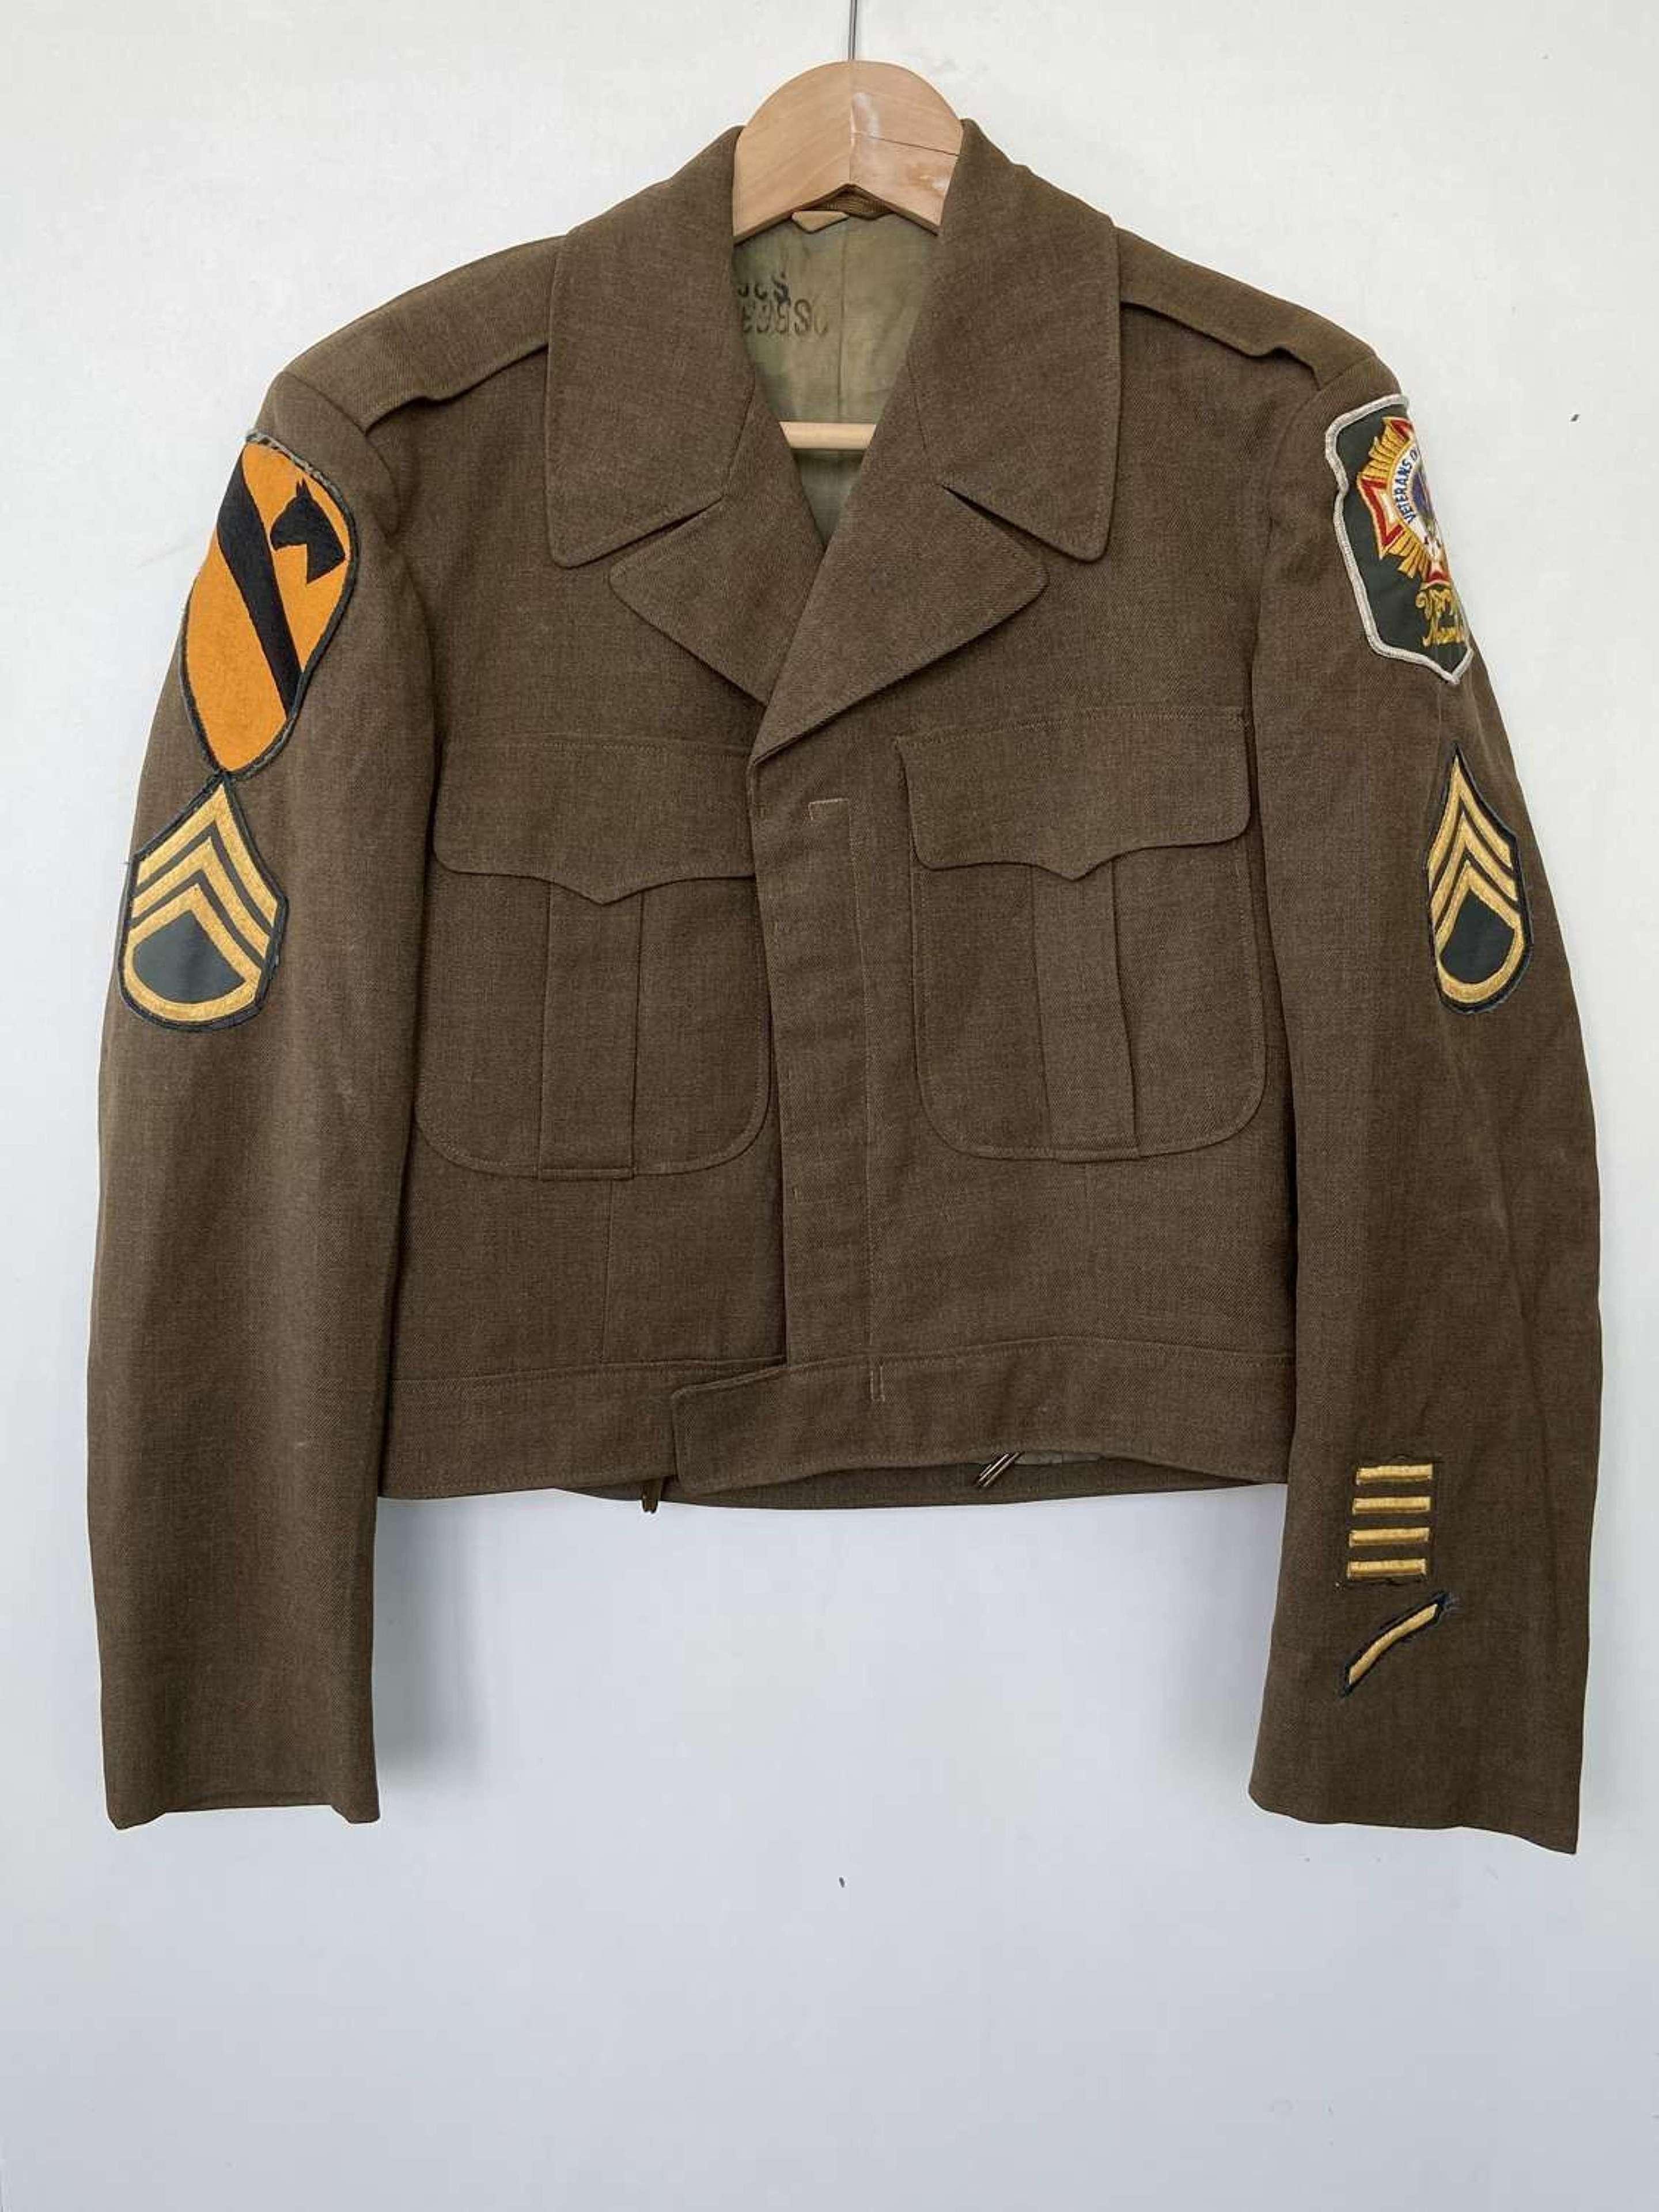 Post WW2 M-1950 United States Army 1st Cavalry Wool Jacket